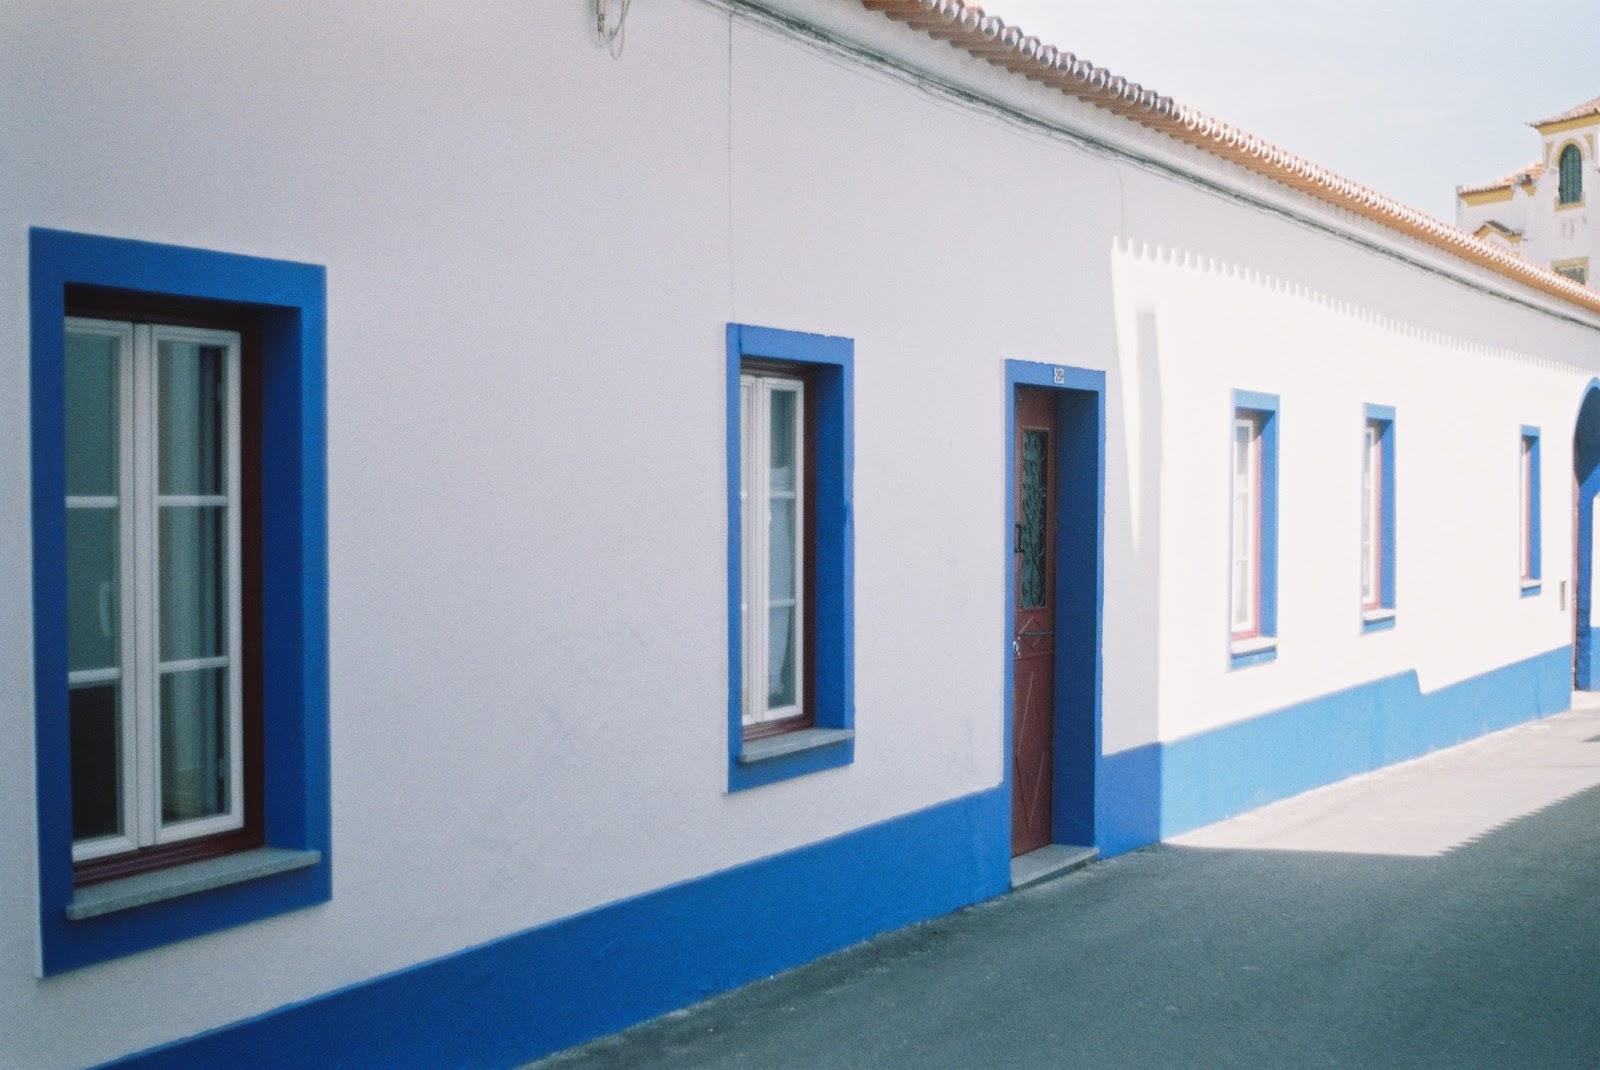 Alentejo Travel Guide - Reguengos de Monsaraz | oandrajos.blogspot.co.uk